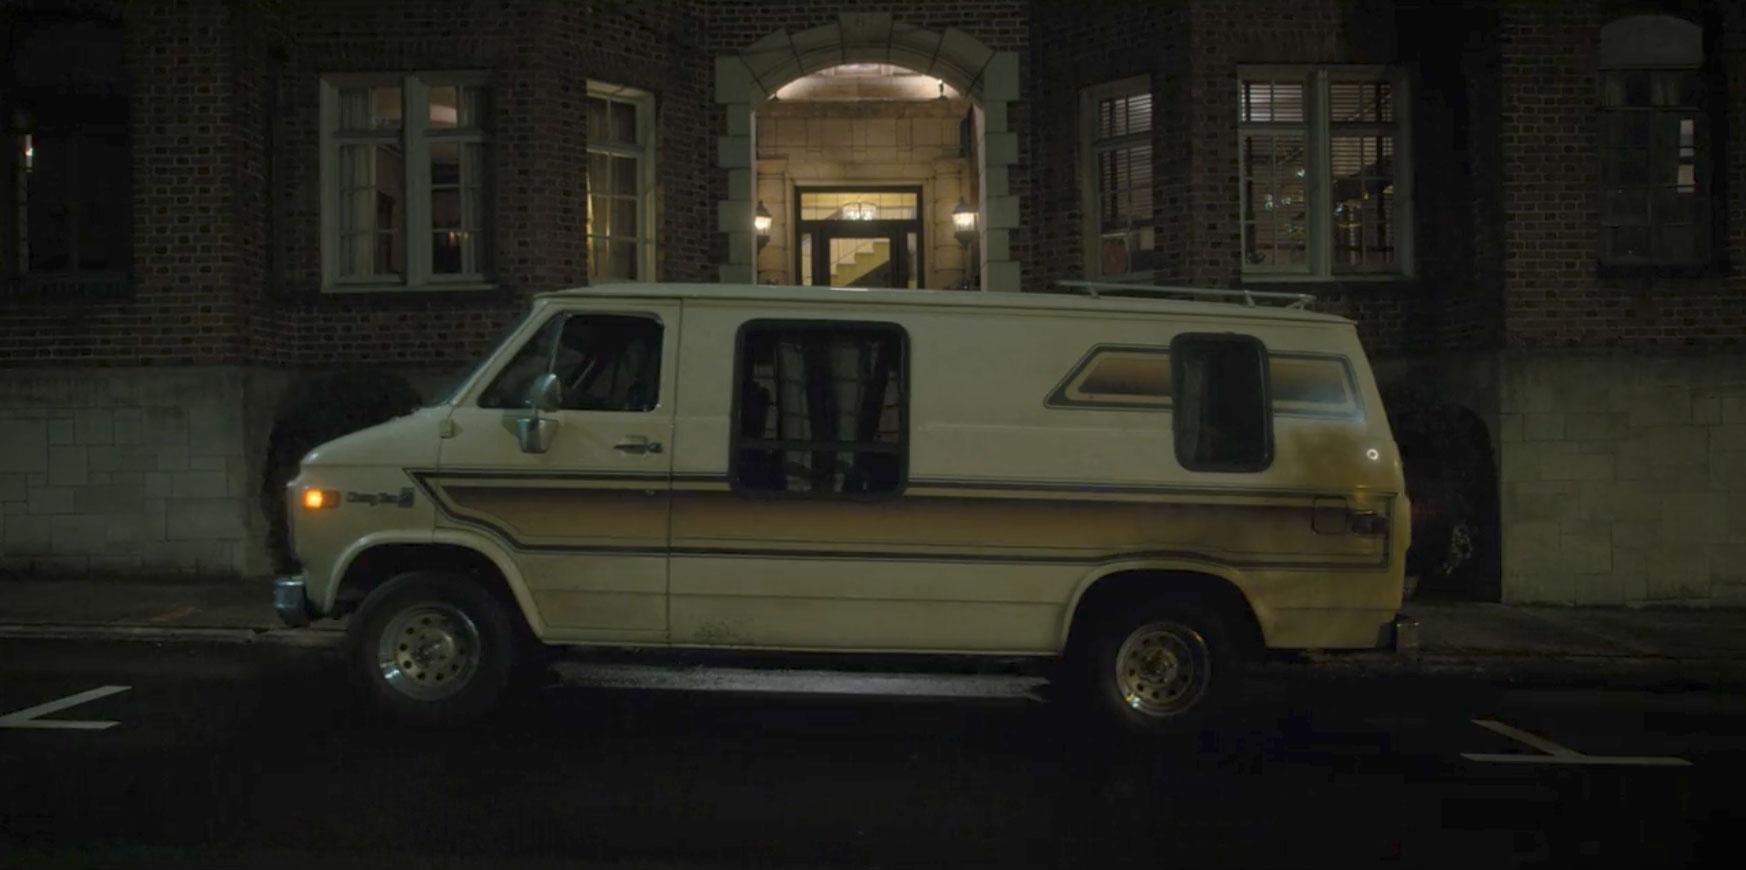 1981-82 Chevrolet Van in Stranger Things